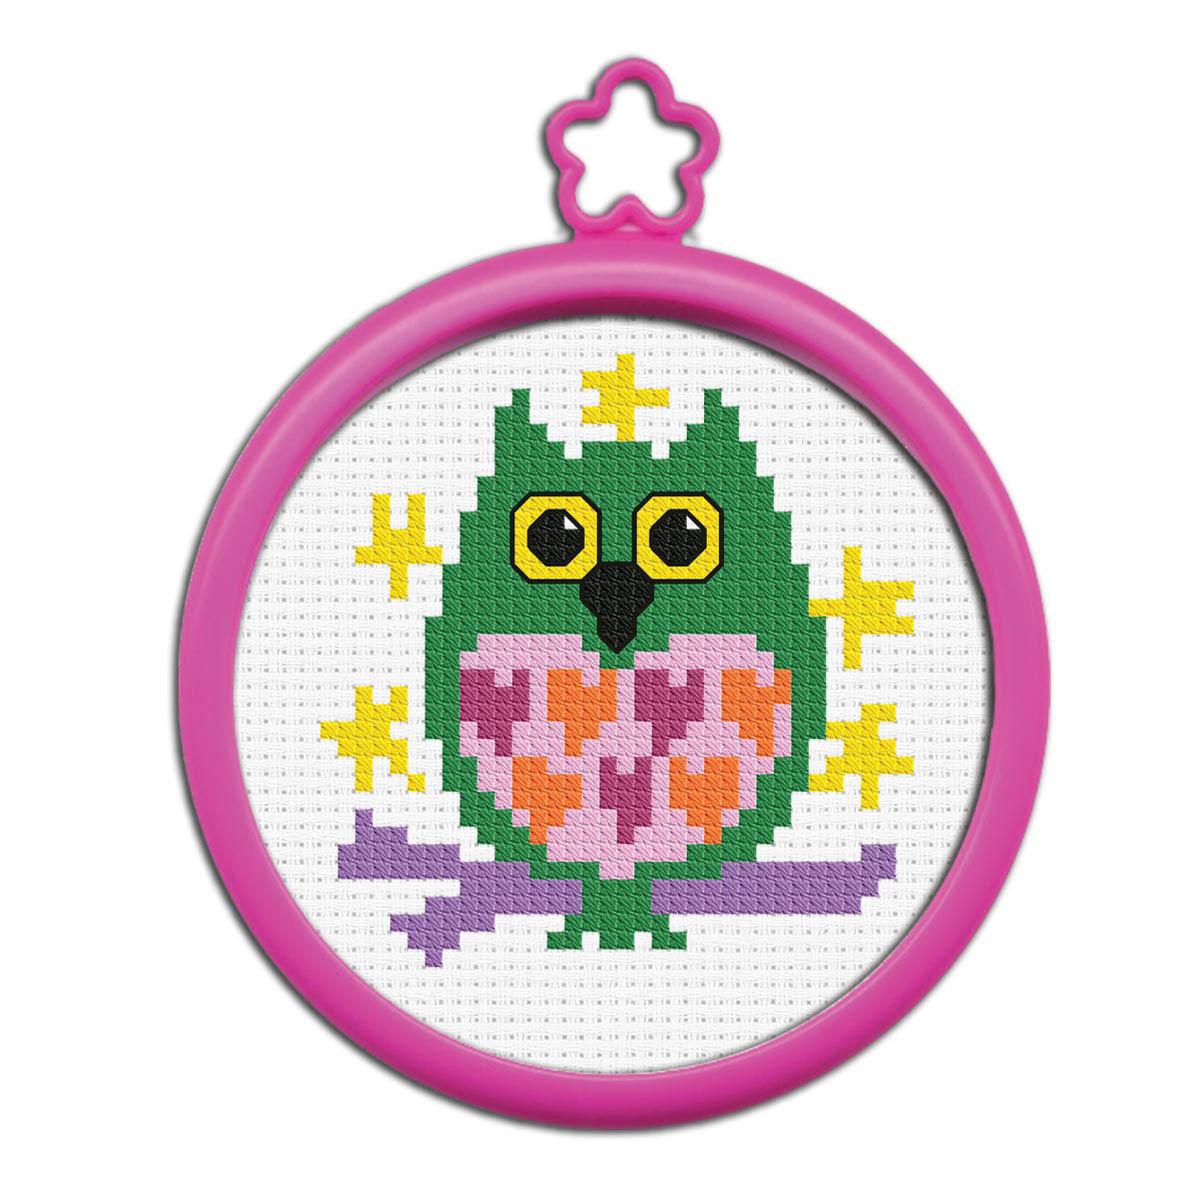 Bucilla ® My 1st Stitch™ - Counted Cross Stitch Kits - Mini - Owl